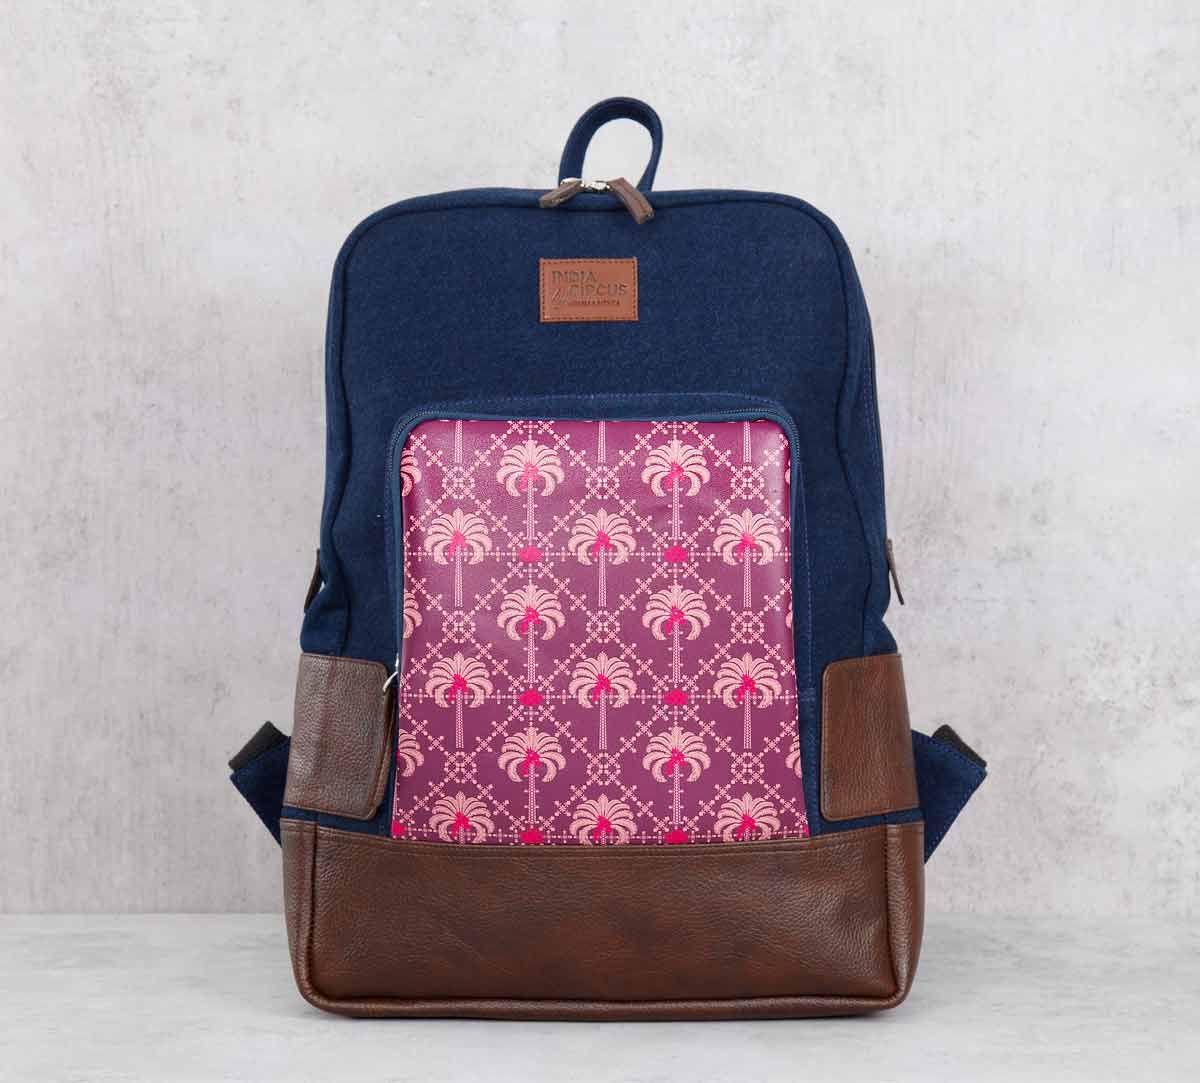 India Circus Poly Palmeria Denim Backpack